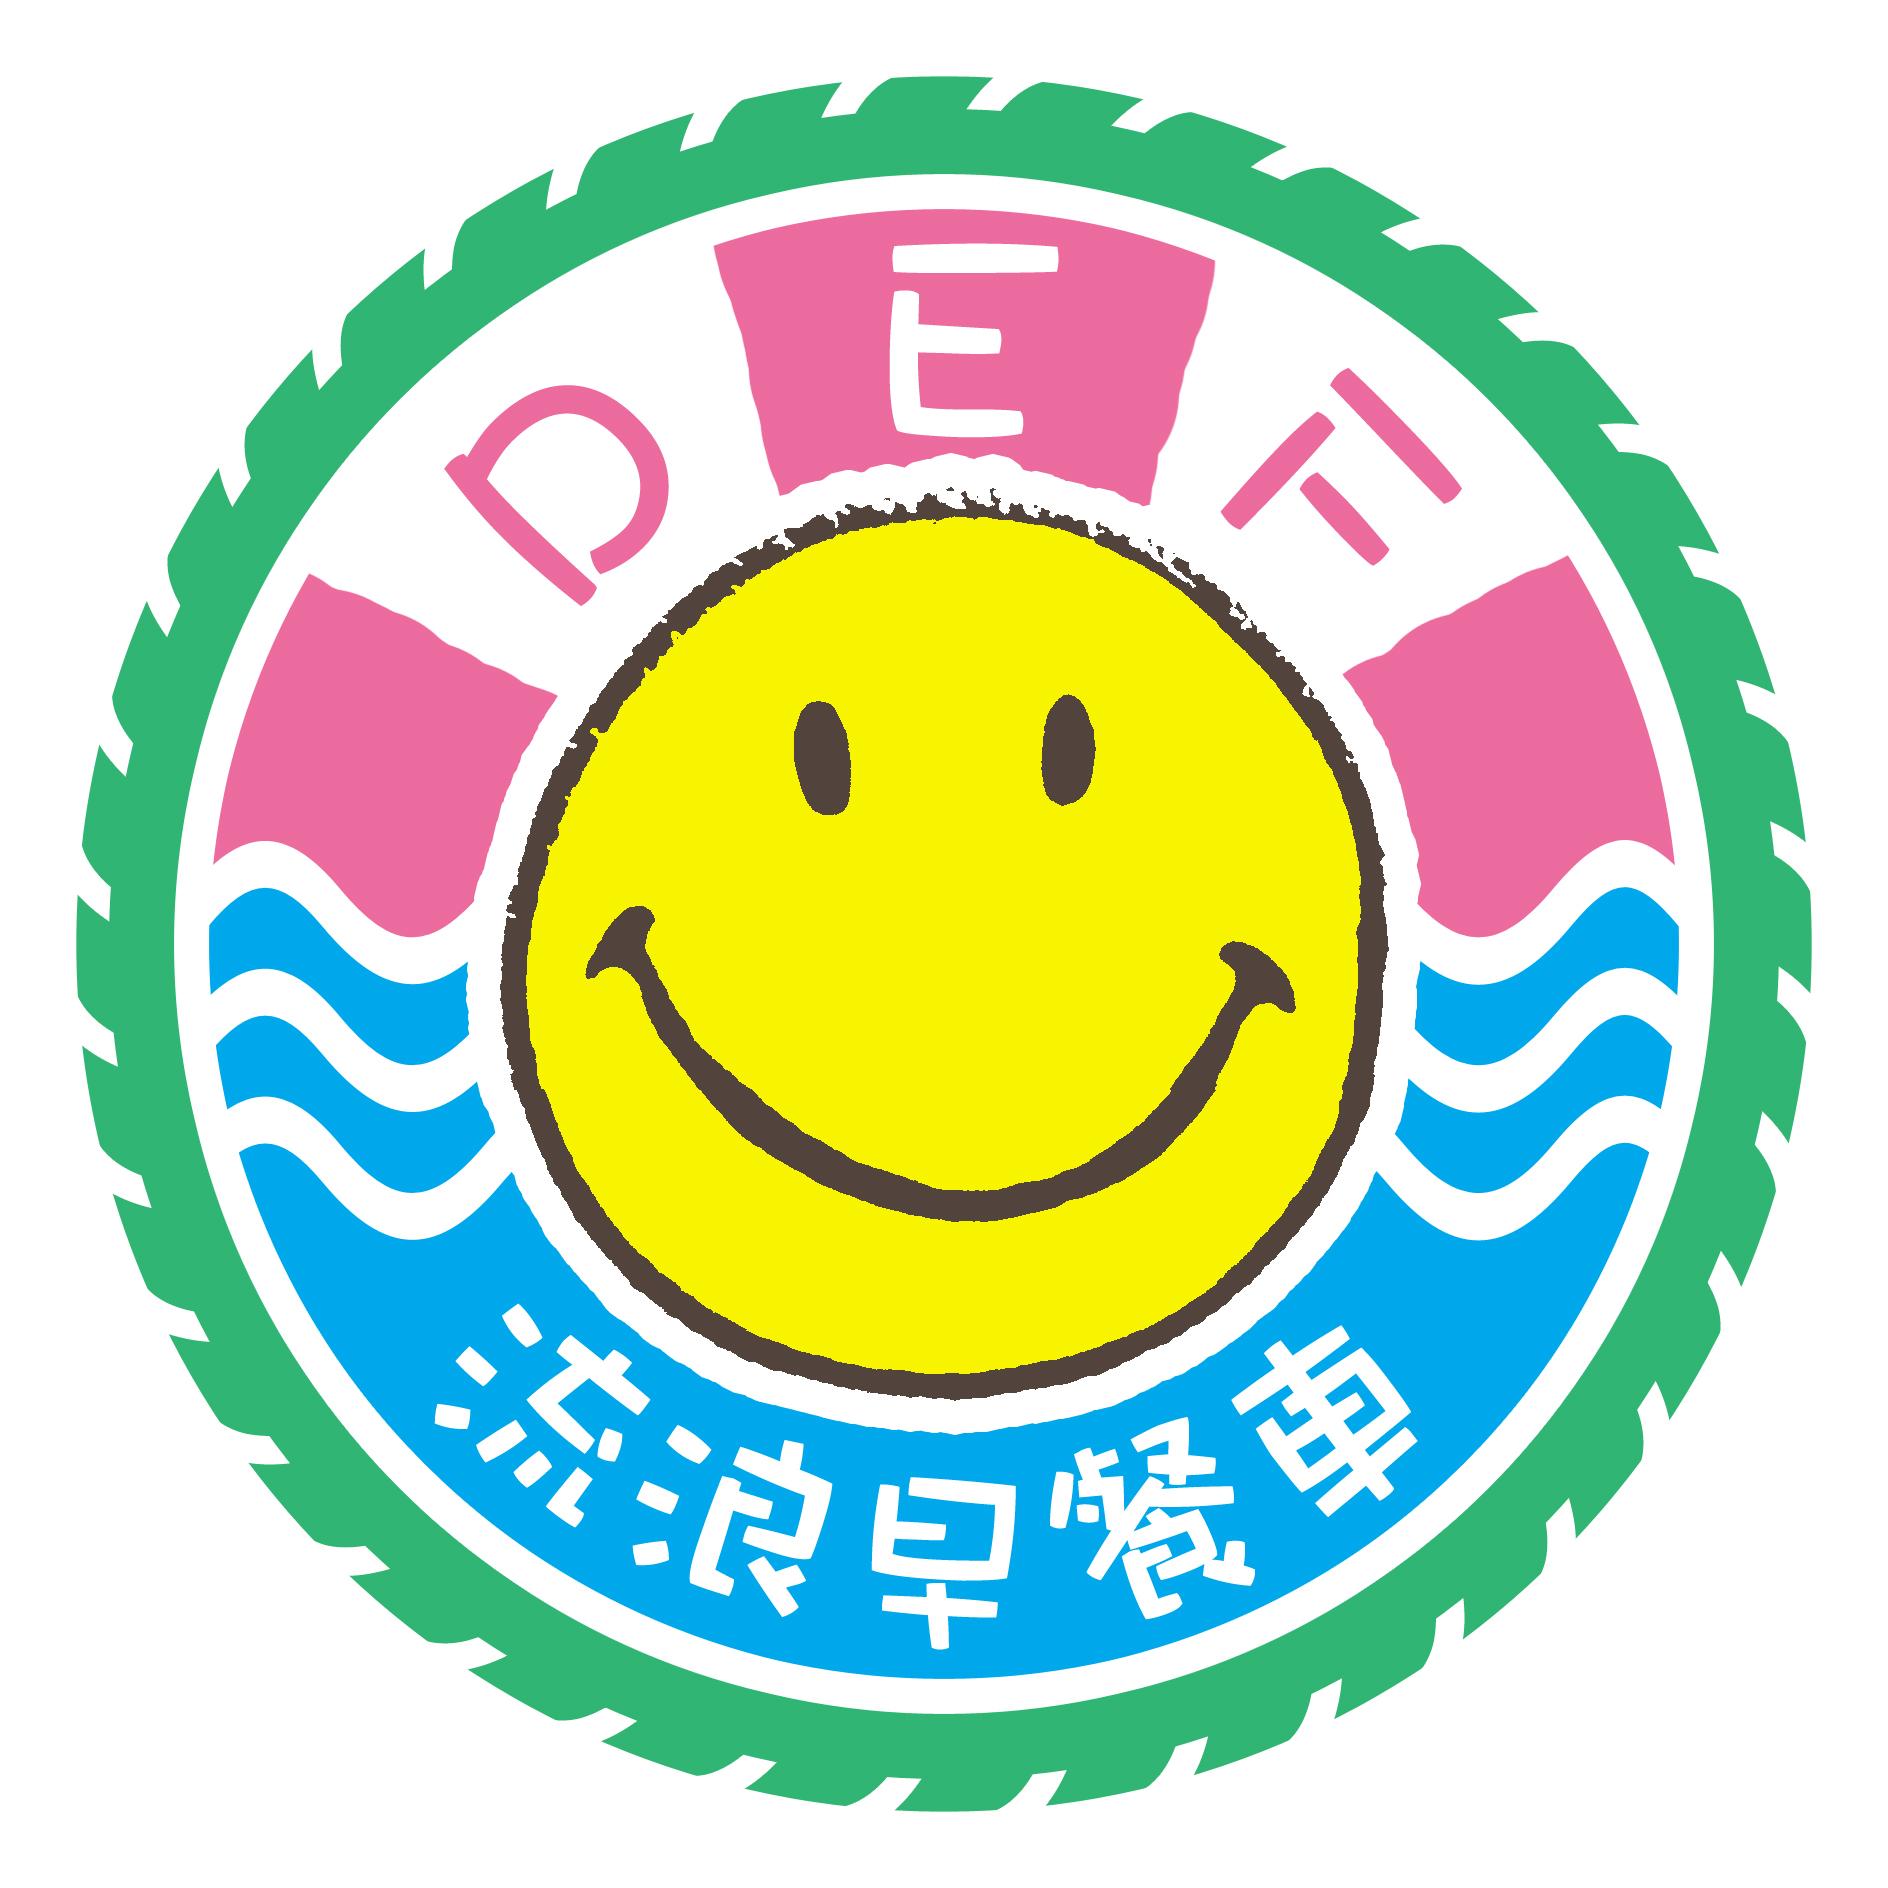 Driftcar_logo 03.jpg